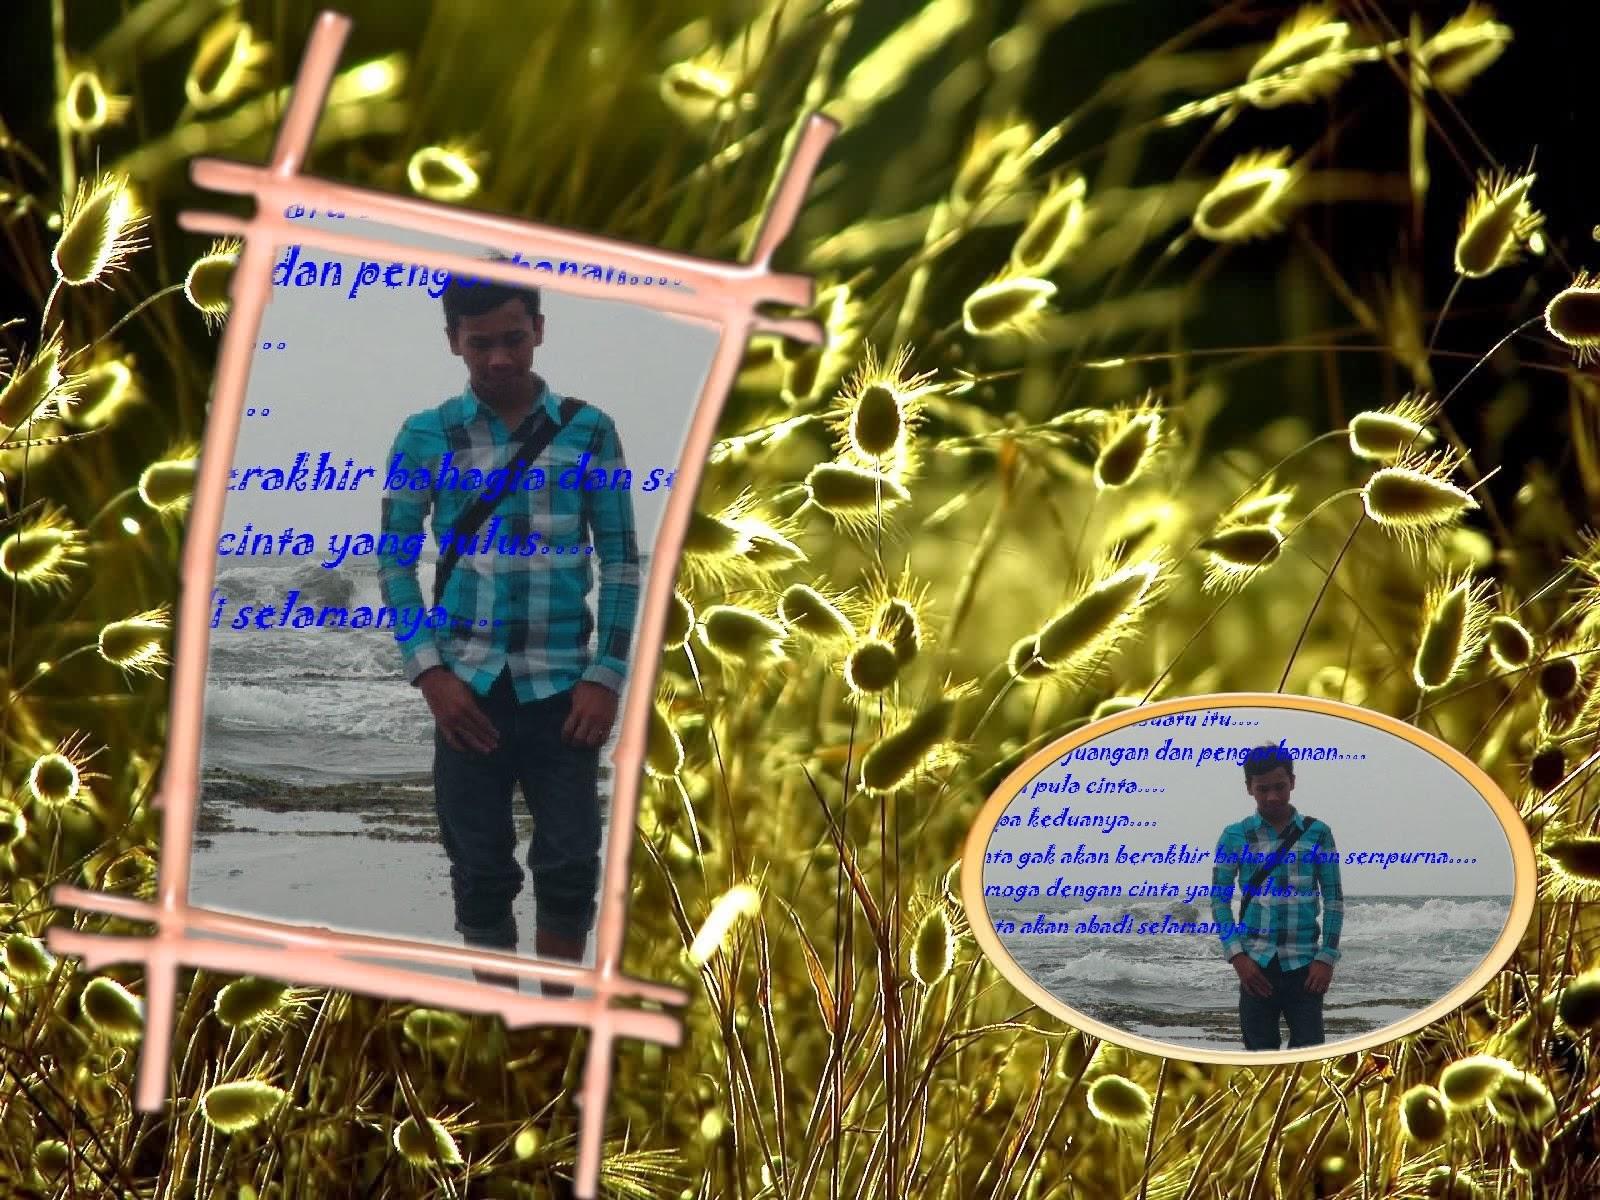 marc abitbol photo p2nK3b